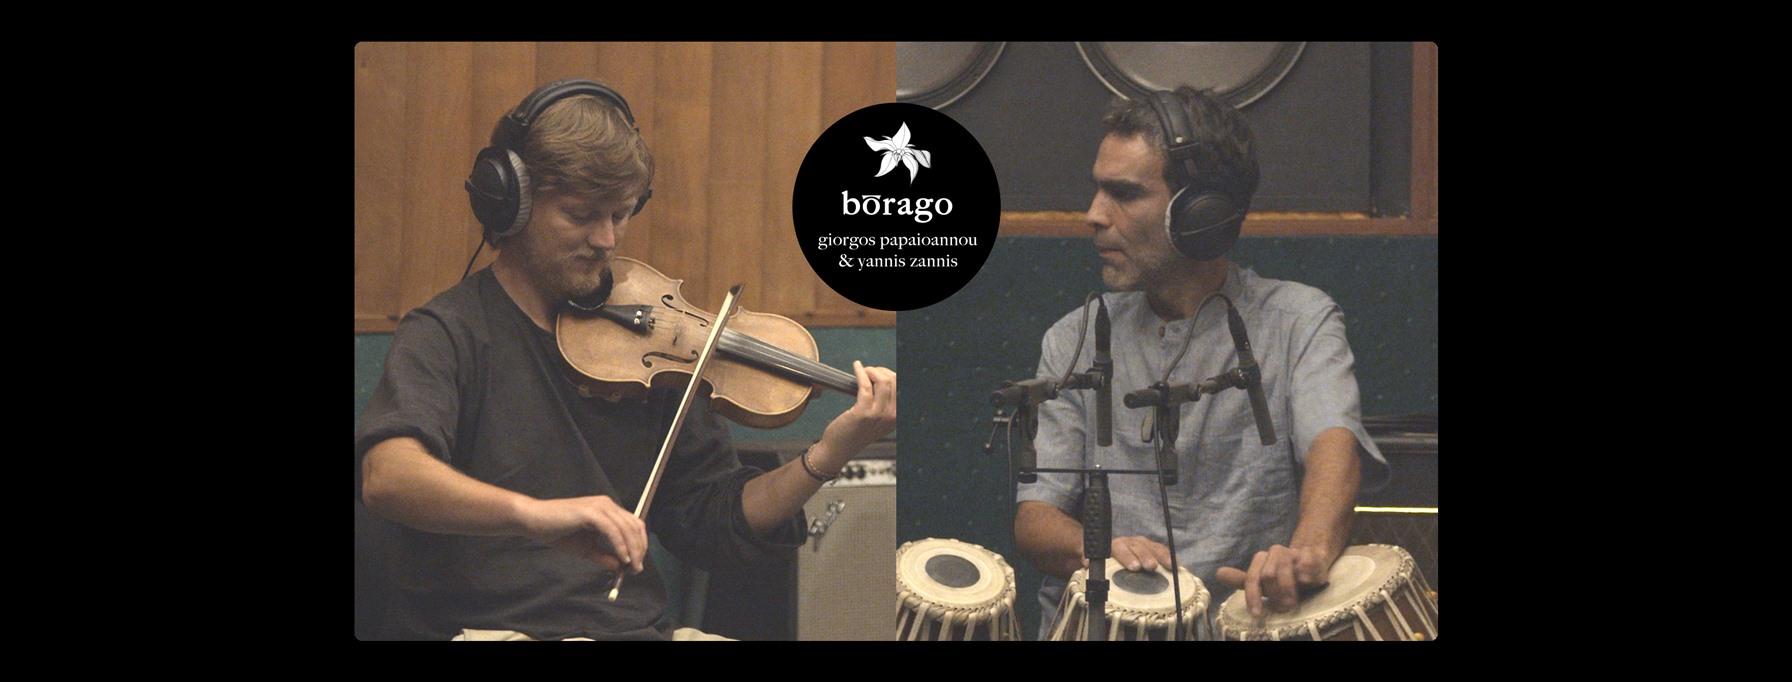 Borago Kickstarter image